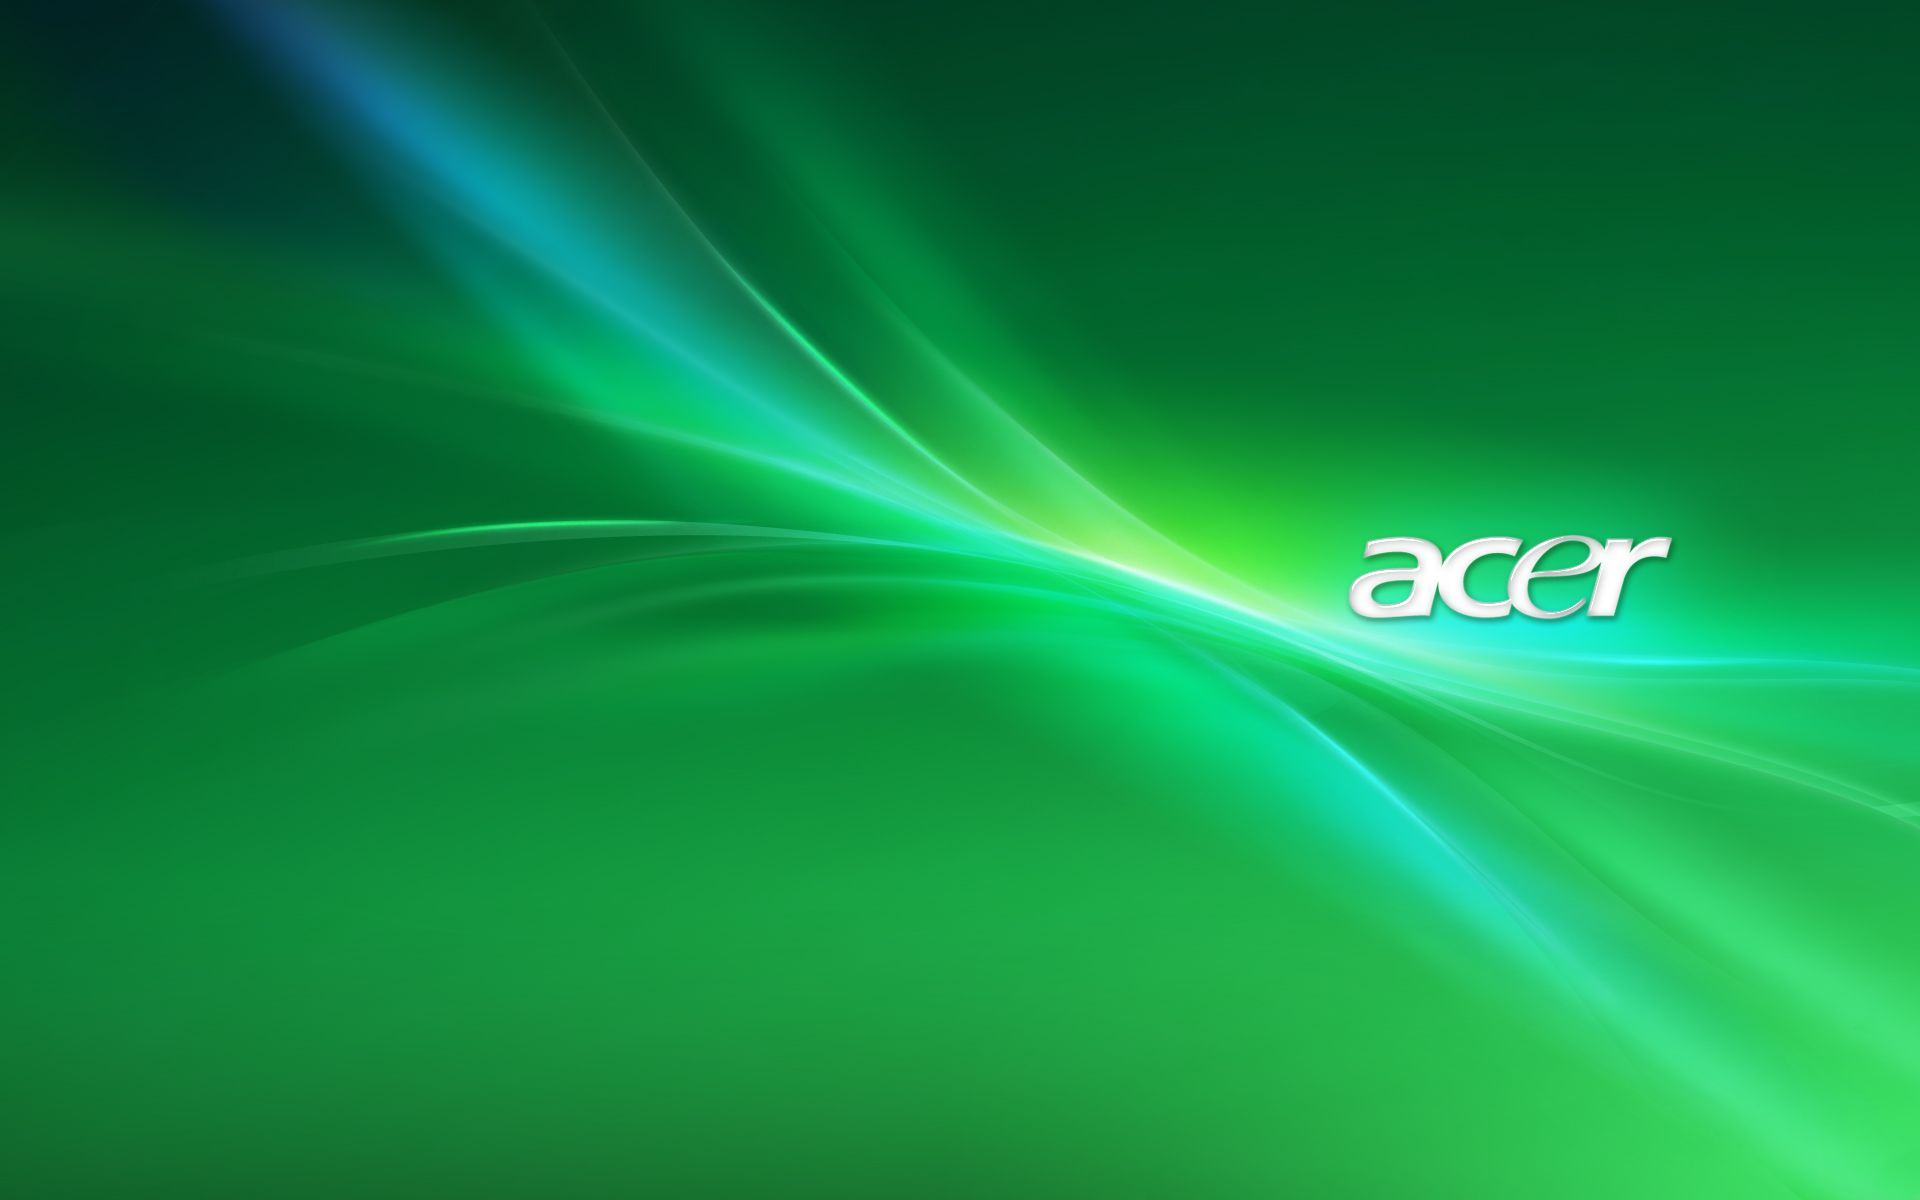 Acer Wallpaper Desktop With Images